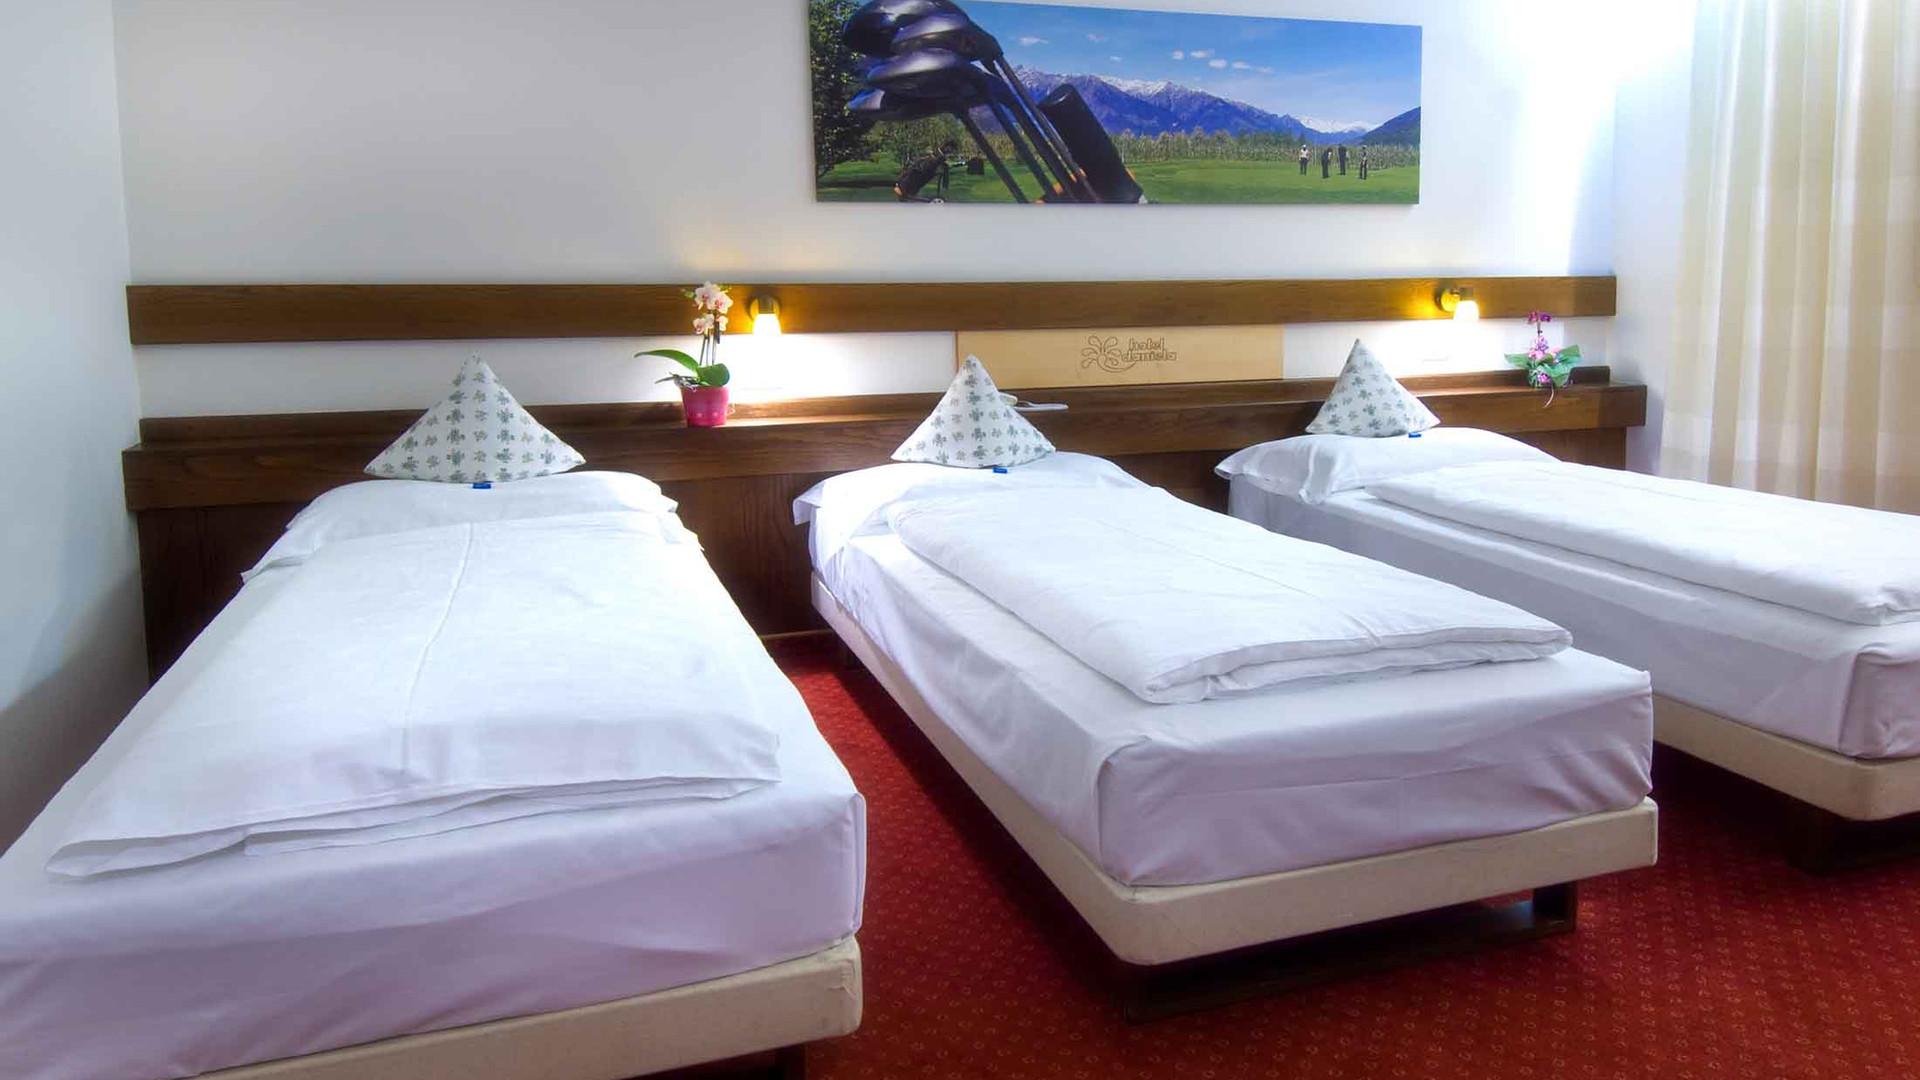 Hotel_Daniela_Merano_Ristorante_67.jpg